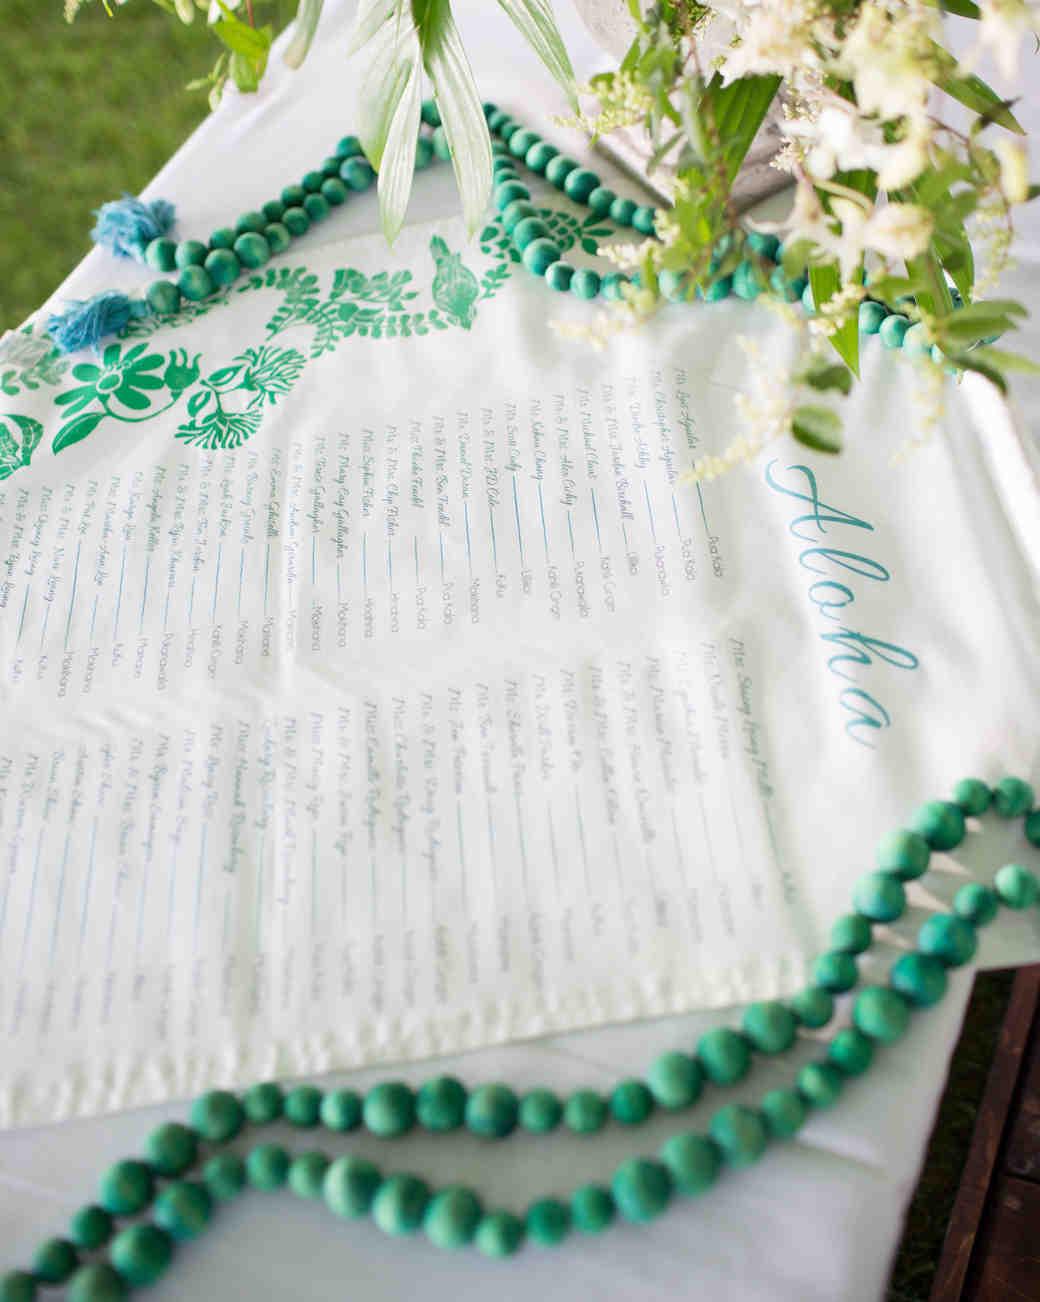 maddie-tony-wedding-seatingchart-6496-s112424-1015.jpg